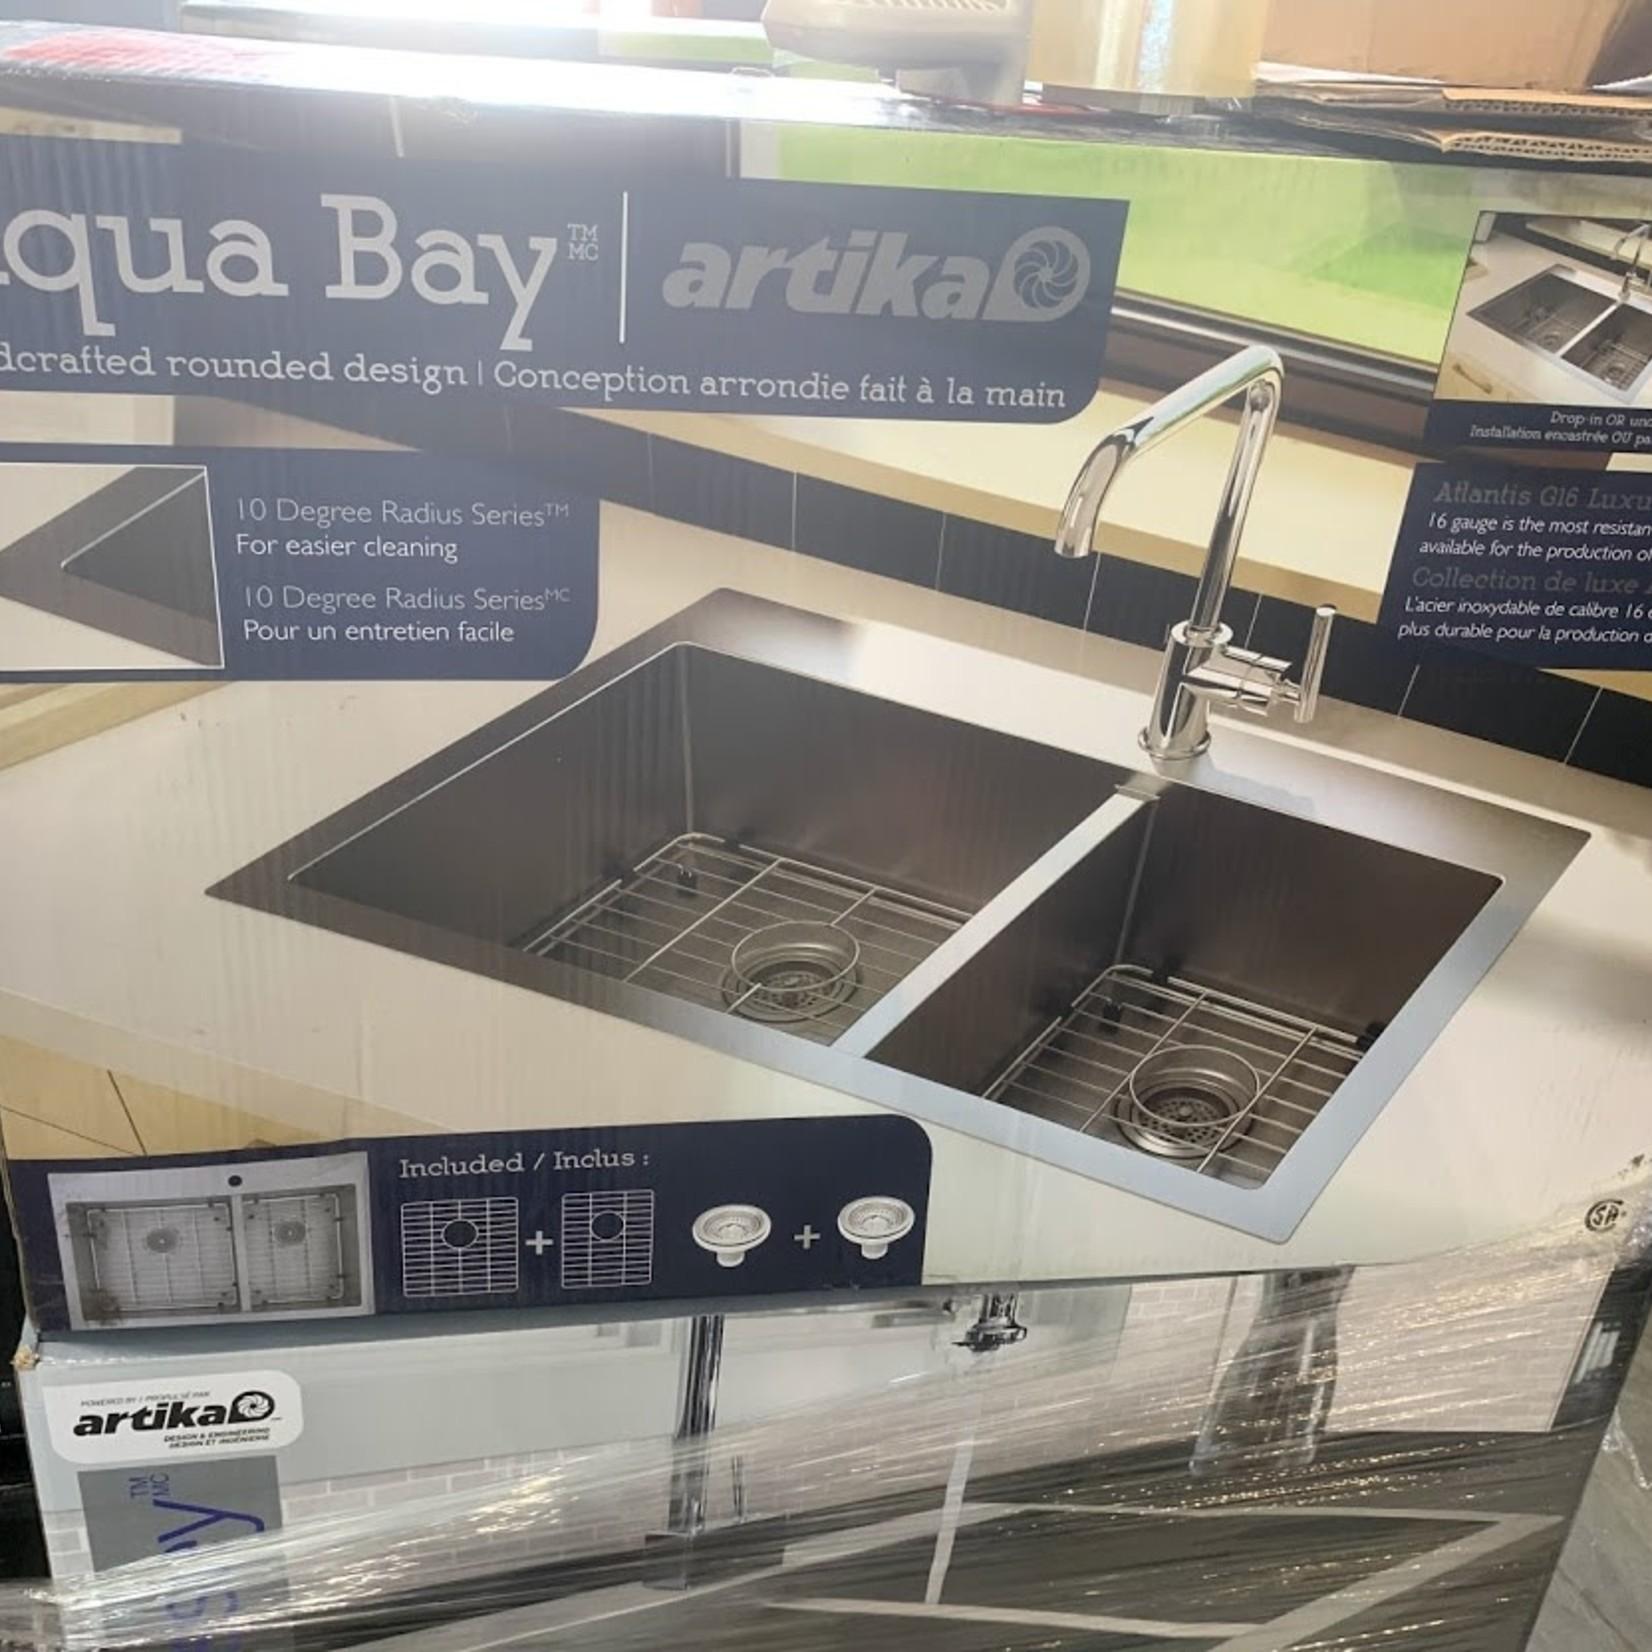 Artika Aqua Bay Atlantis G16 Luxury 60/40 Sink with Grids 31.25-in X 20.5-in X 9in